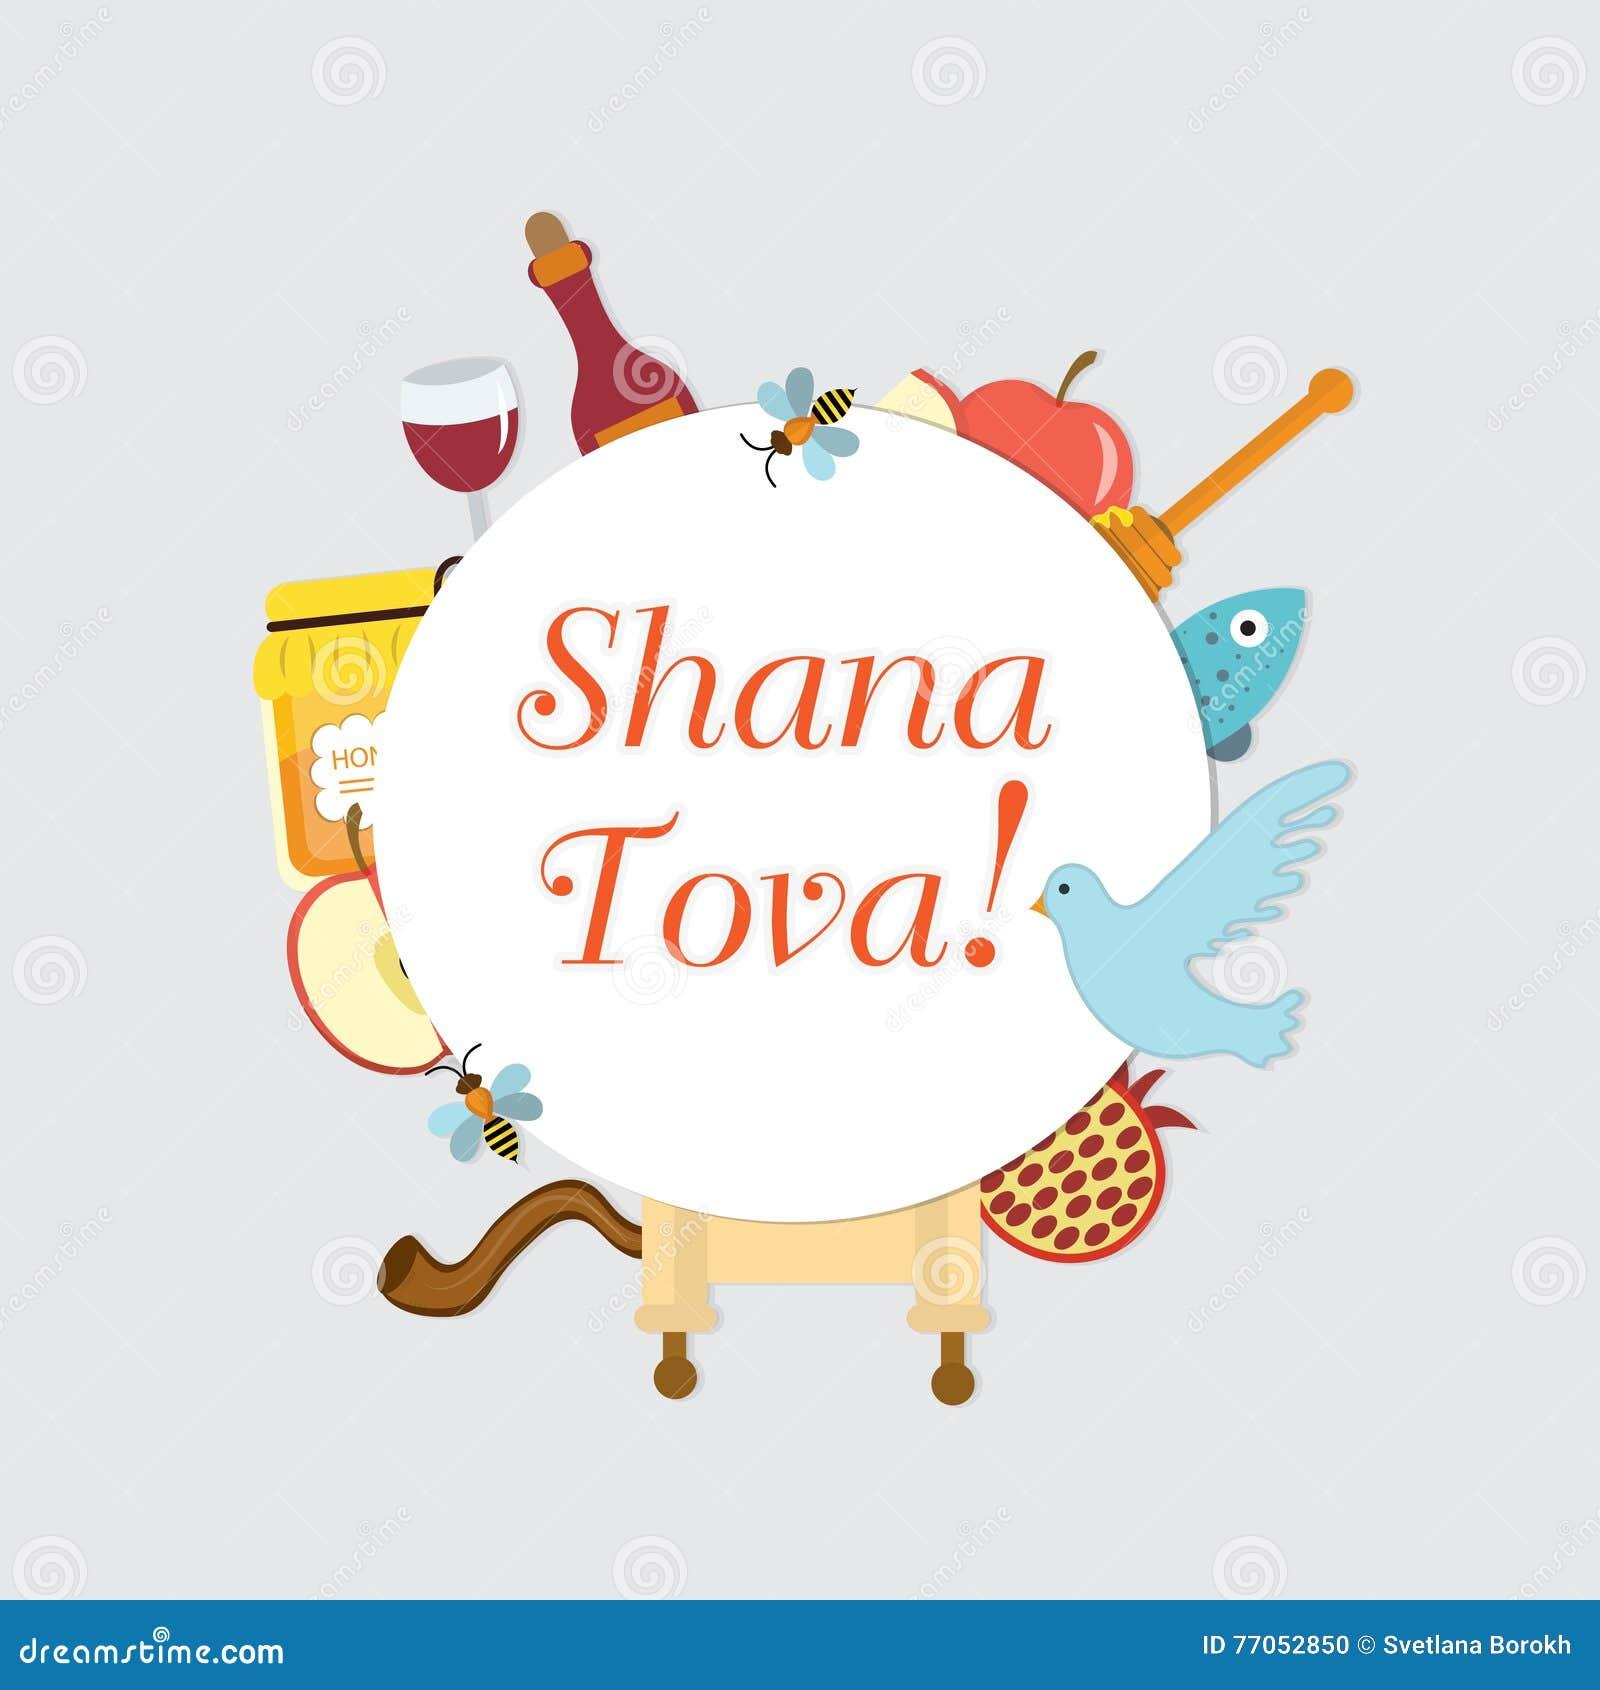 Set icons on the jewish new year rosh hashanah shana tova rosh set icons on the jewish new year rosh hashanah shana tova rosh hashanah frame for text greeting card for the jewish new year m4hsunfo